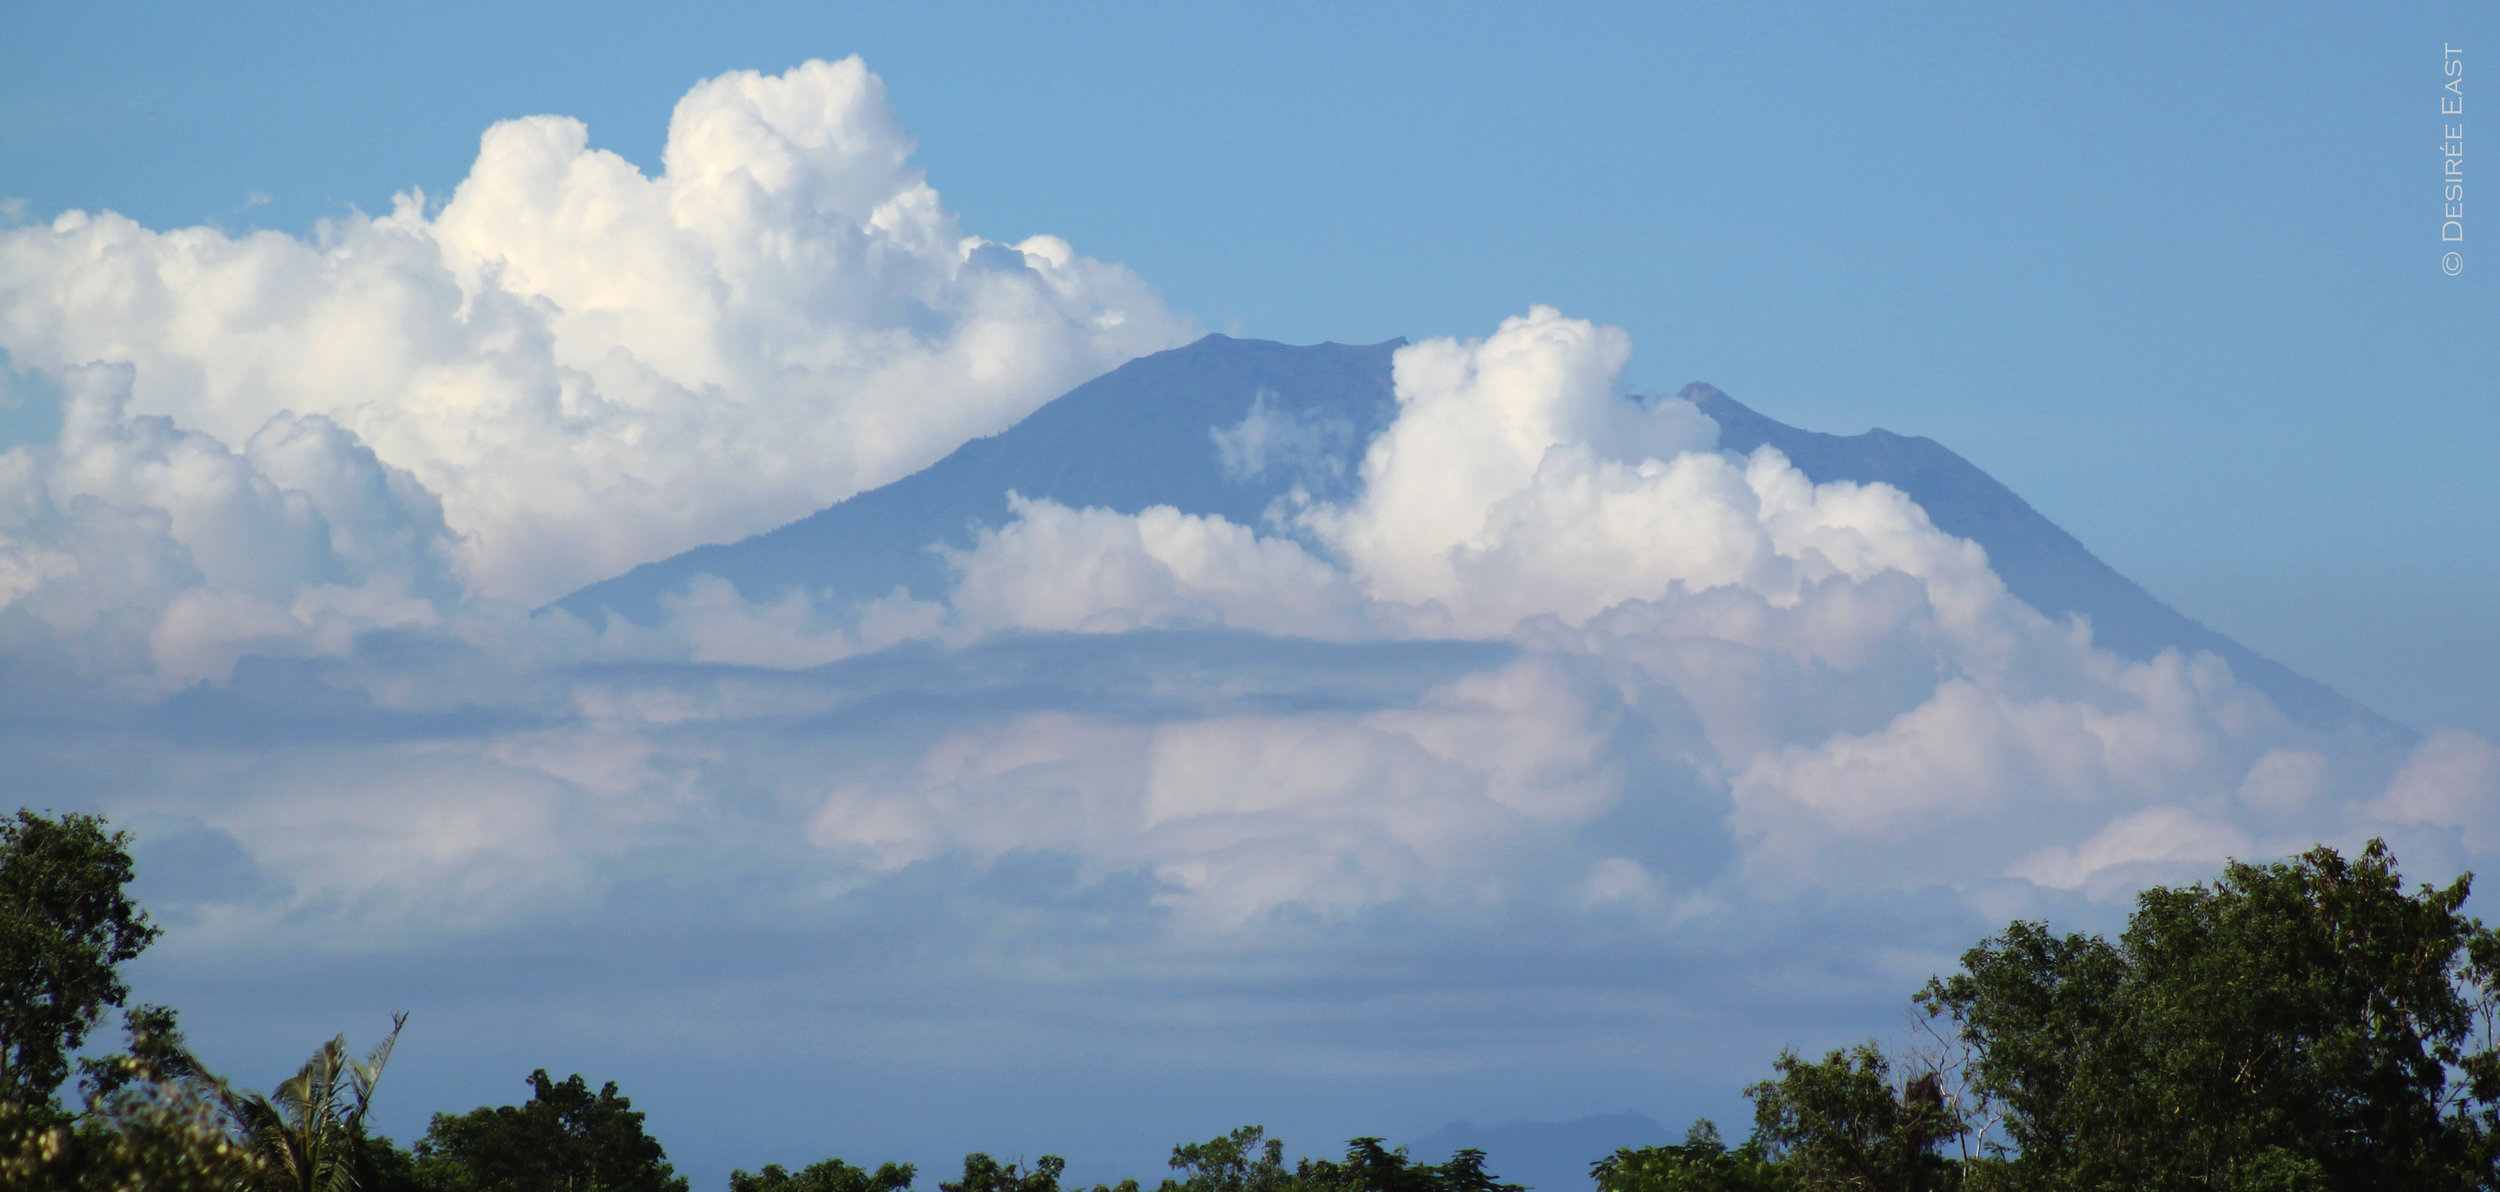 bali volcano. bali, indonesia. photo by desiree east